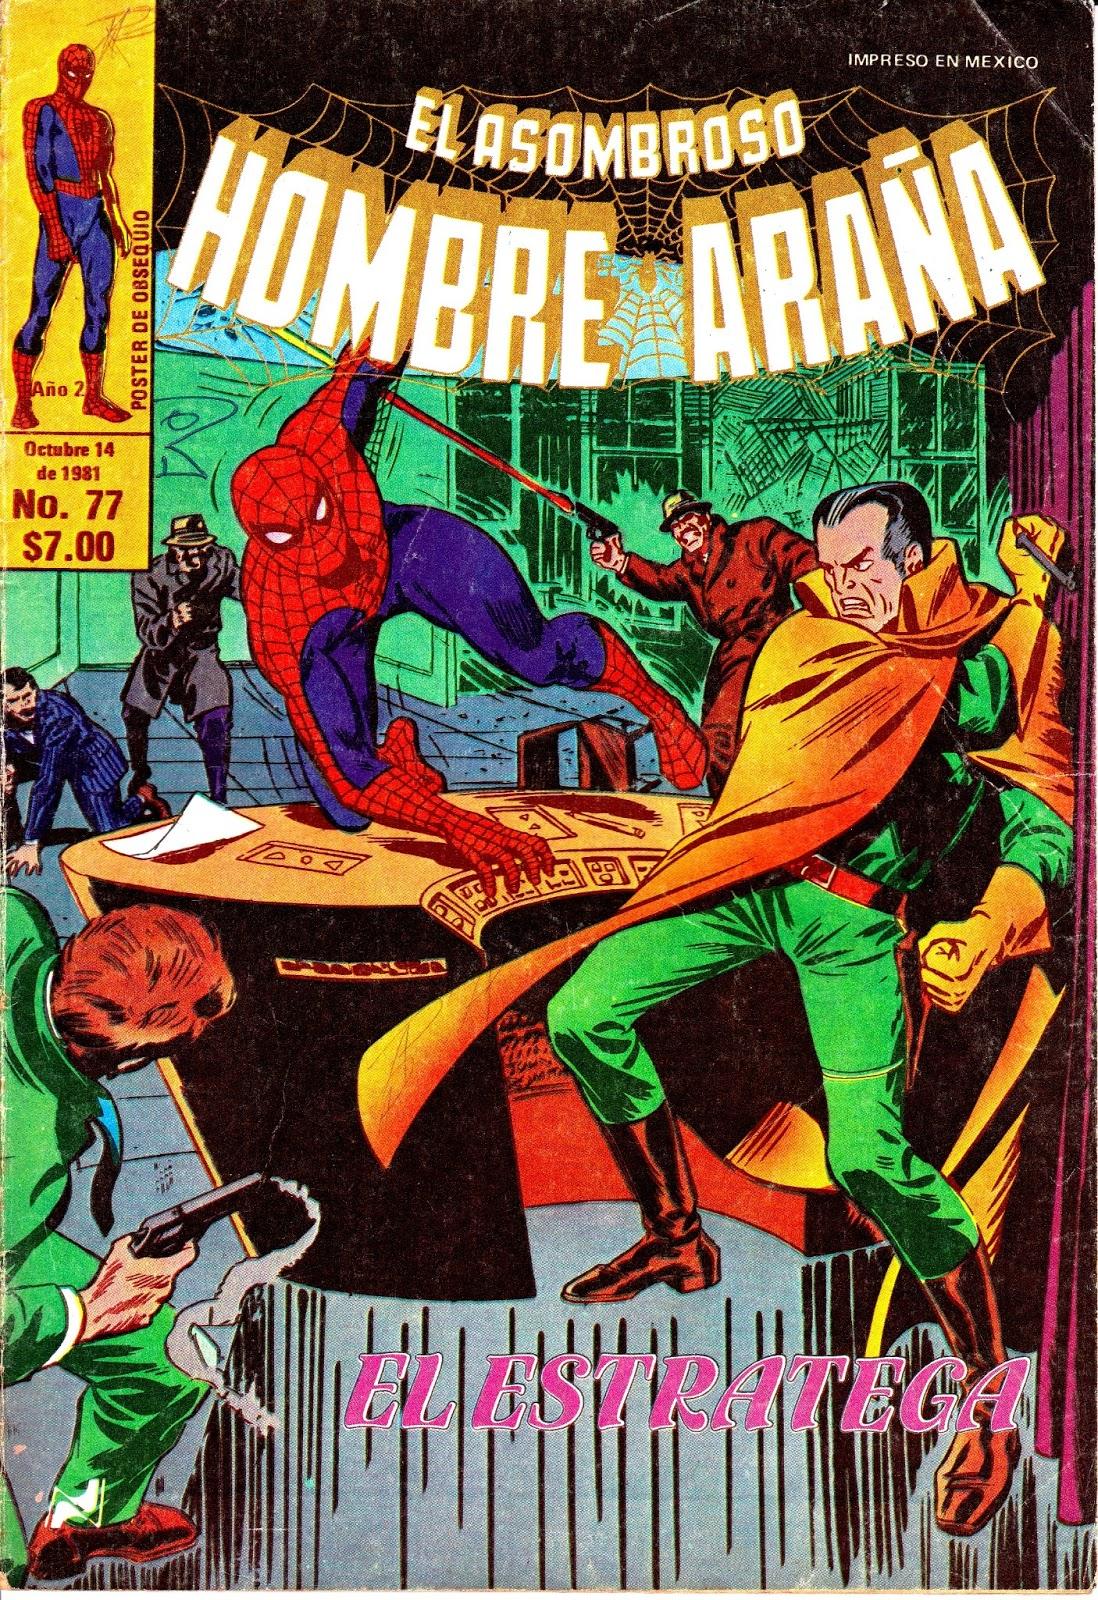 FigurasVitales !!: Un Cómic: Asombroso Hombre Araña # 77